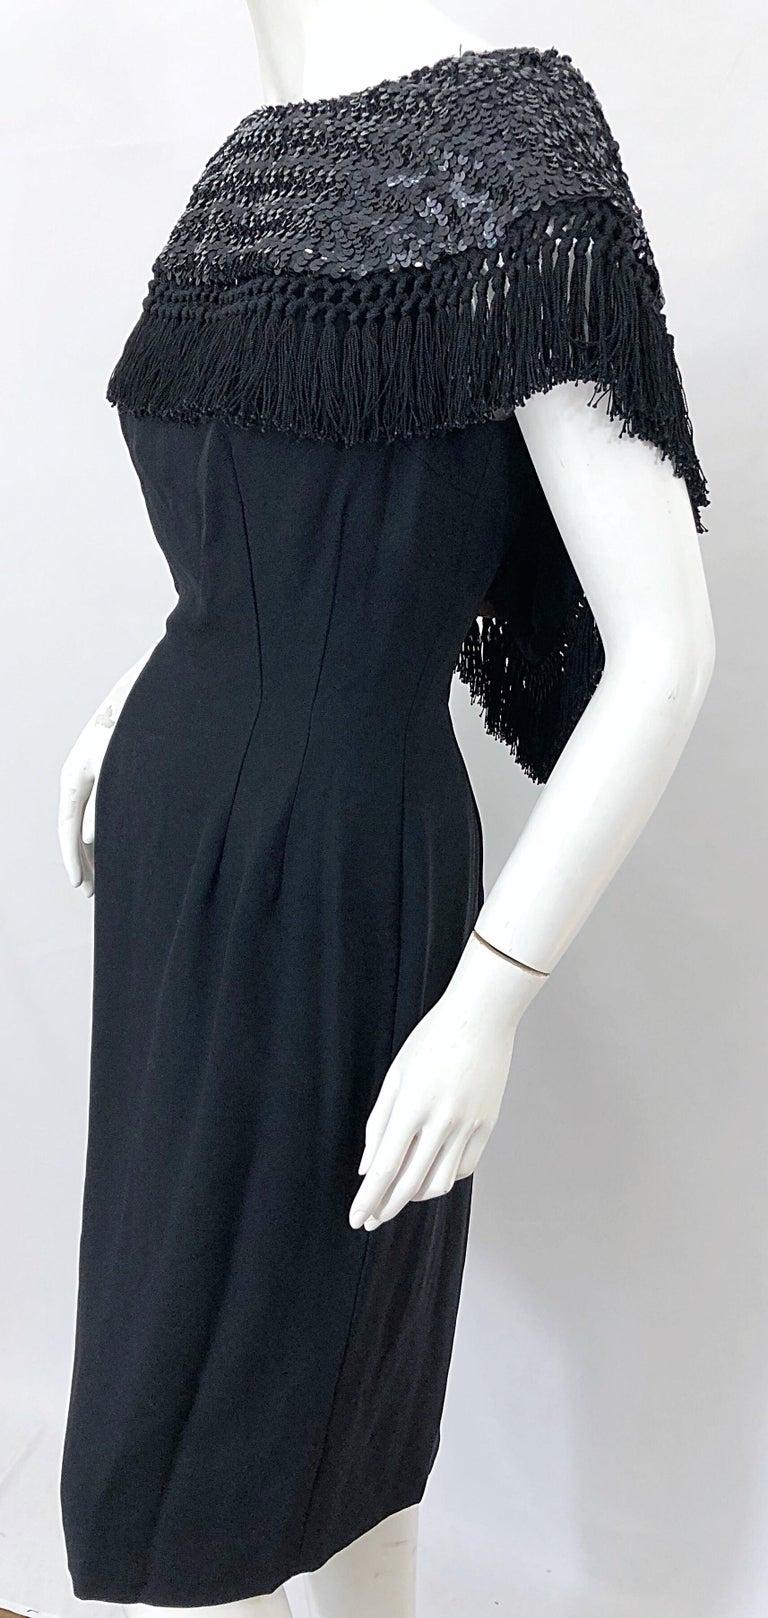 1950s Demi Couture Black Silk Crepe Dramatic Sequin Neck Fringe Vintage Dress For Sale 2